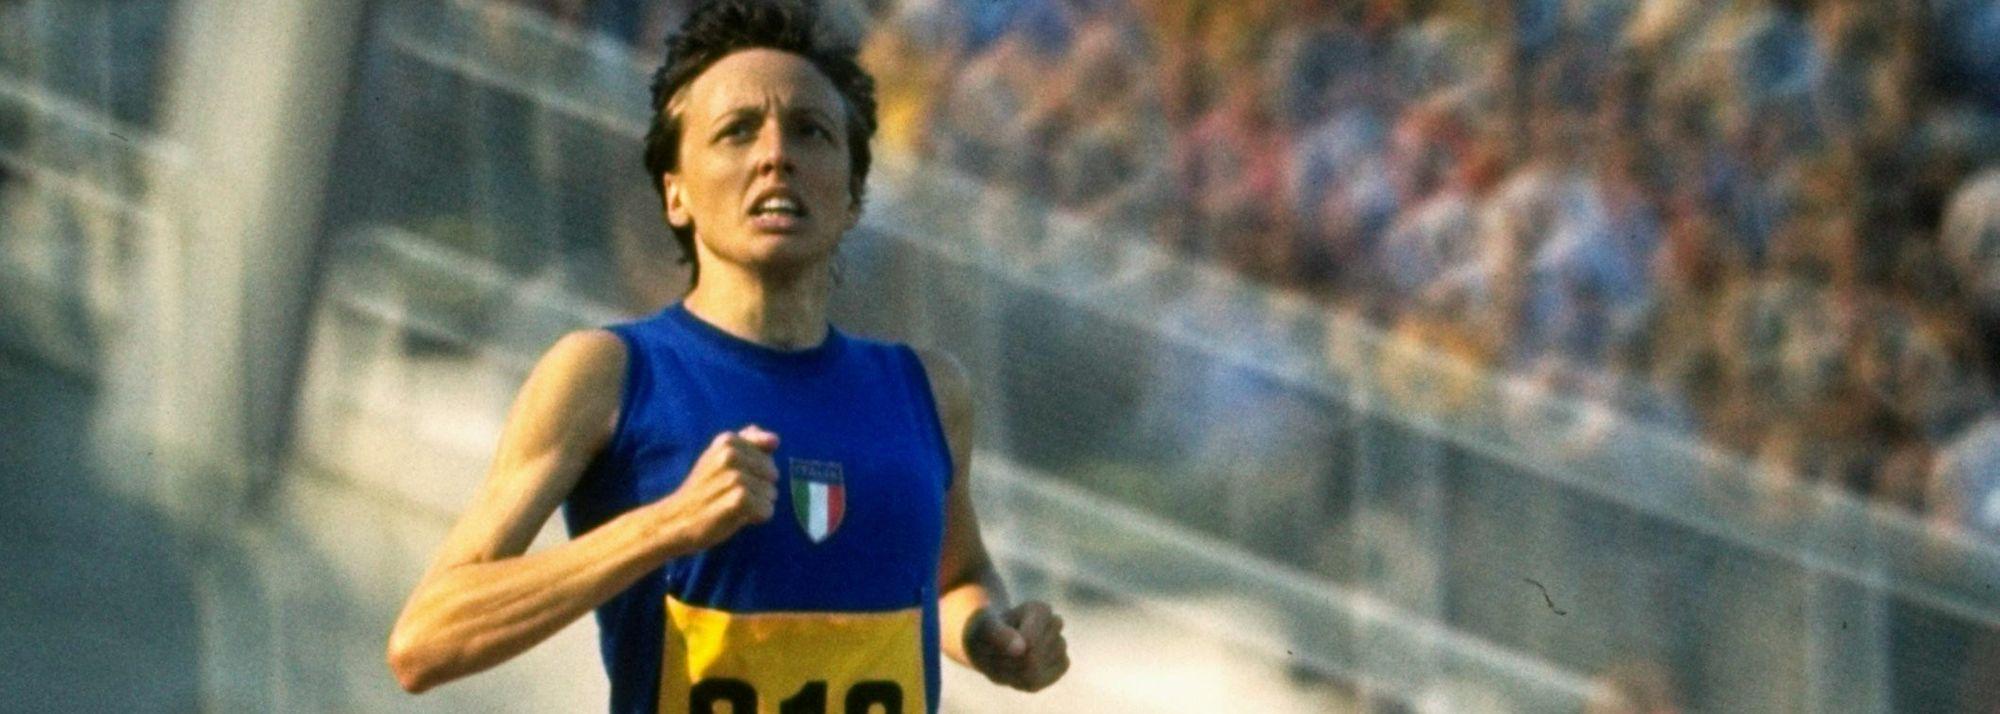 Paola Pigni, 1945-2021